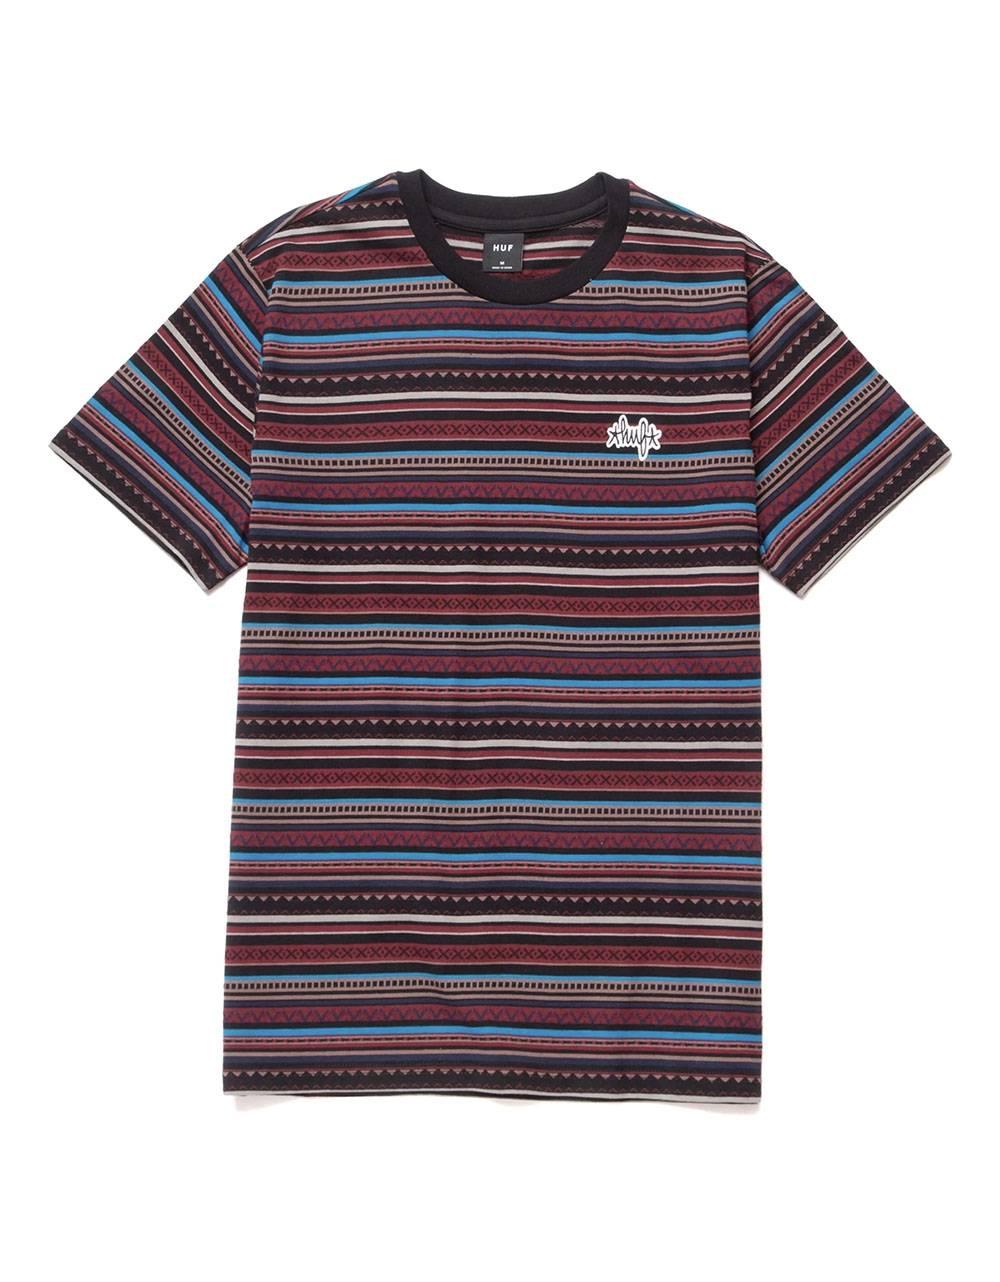 Huf Topanga knit top tee - navy blazer Huf T-shirt 53,28€